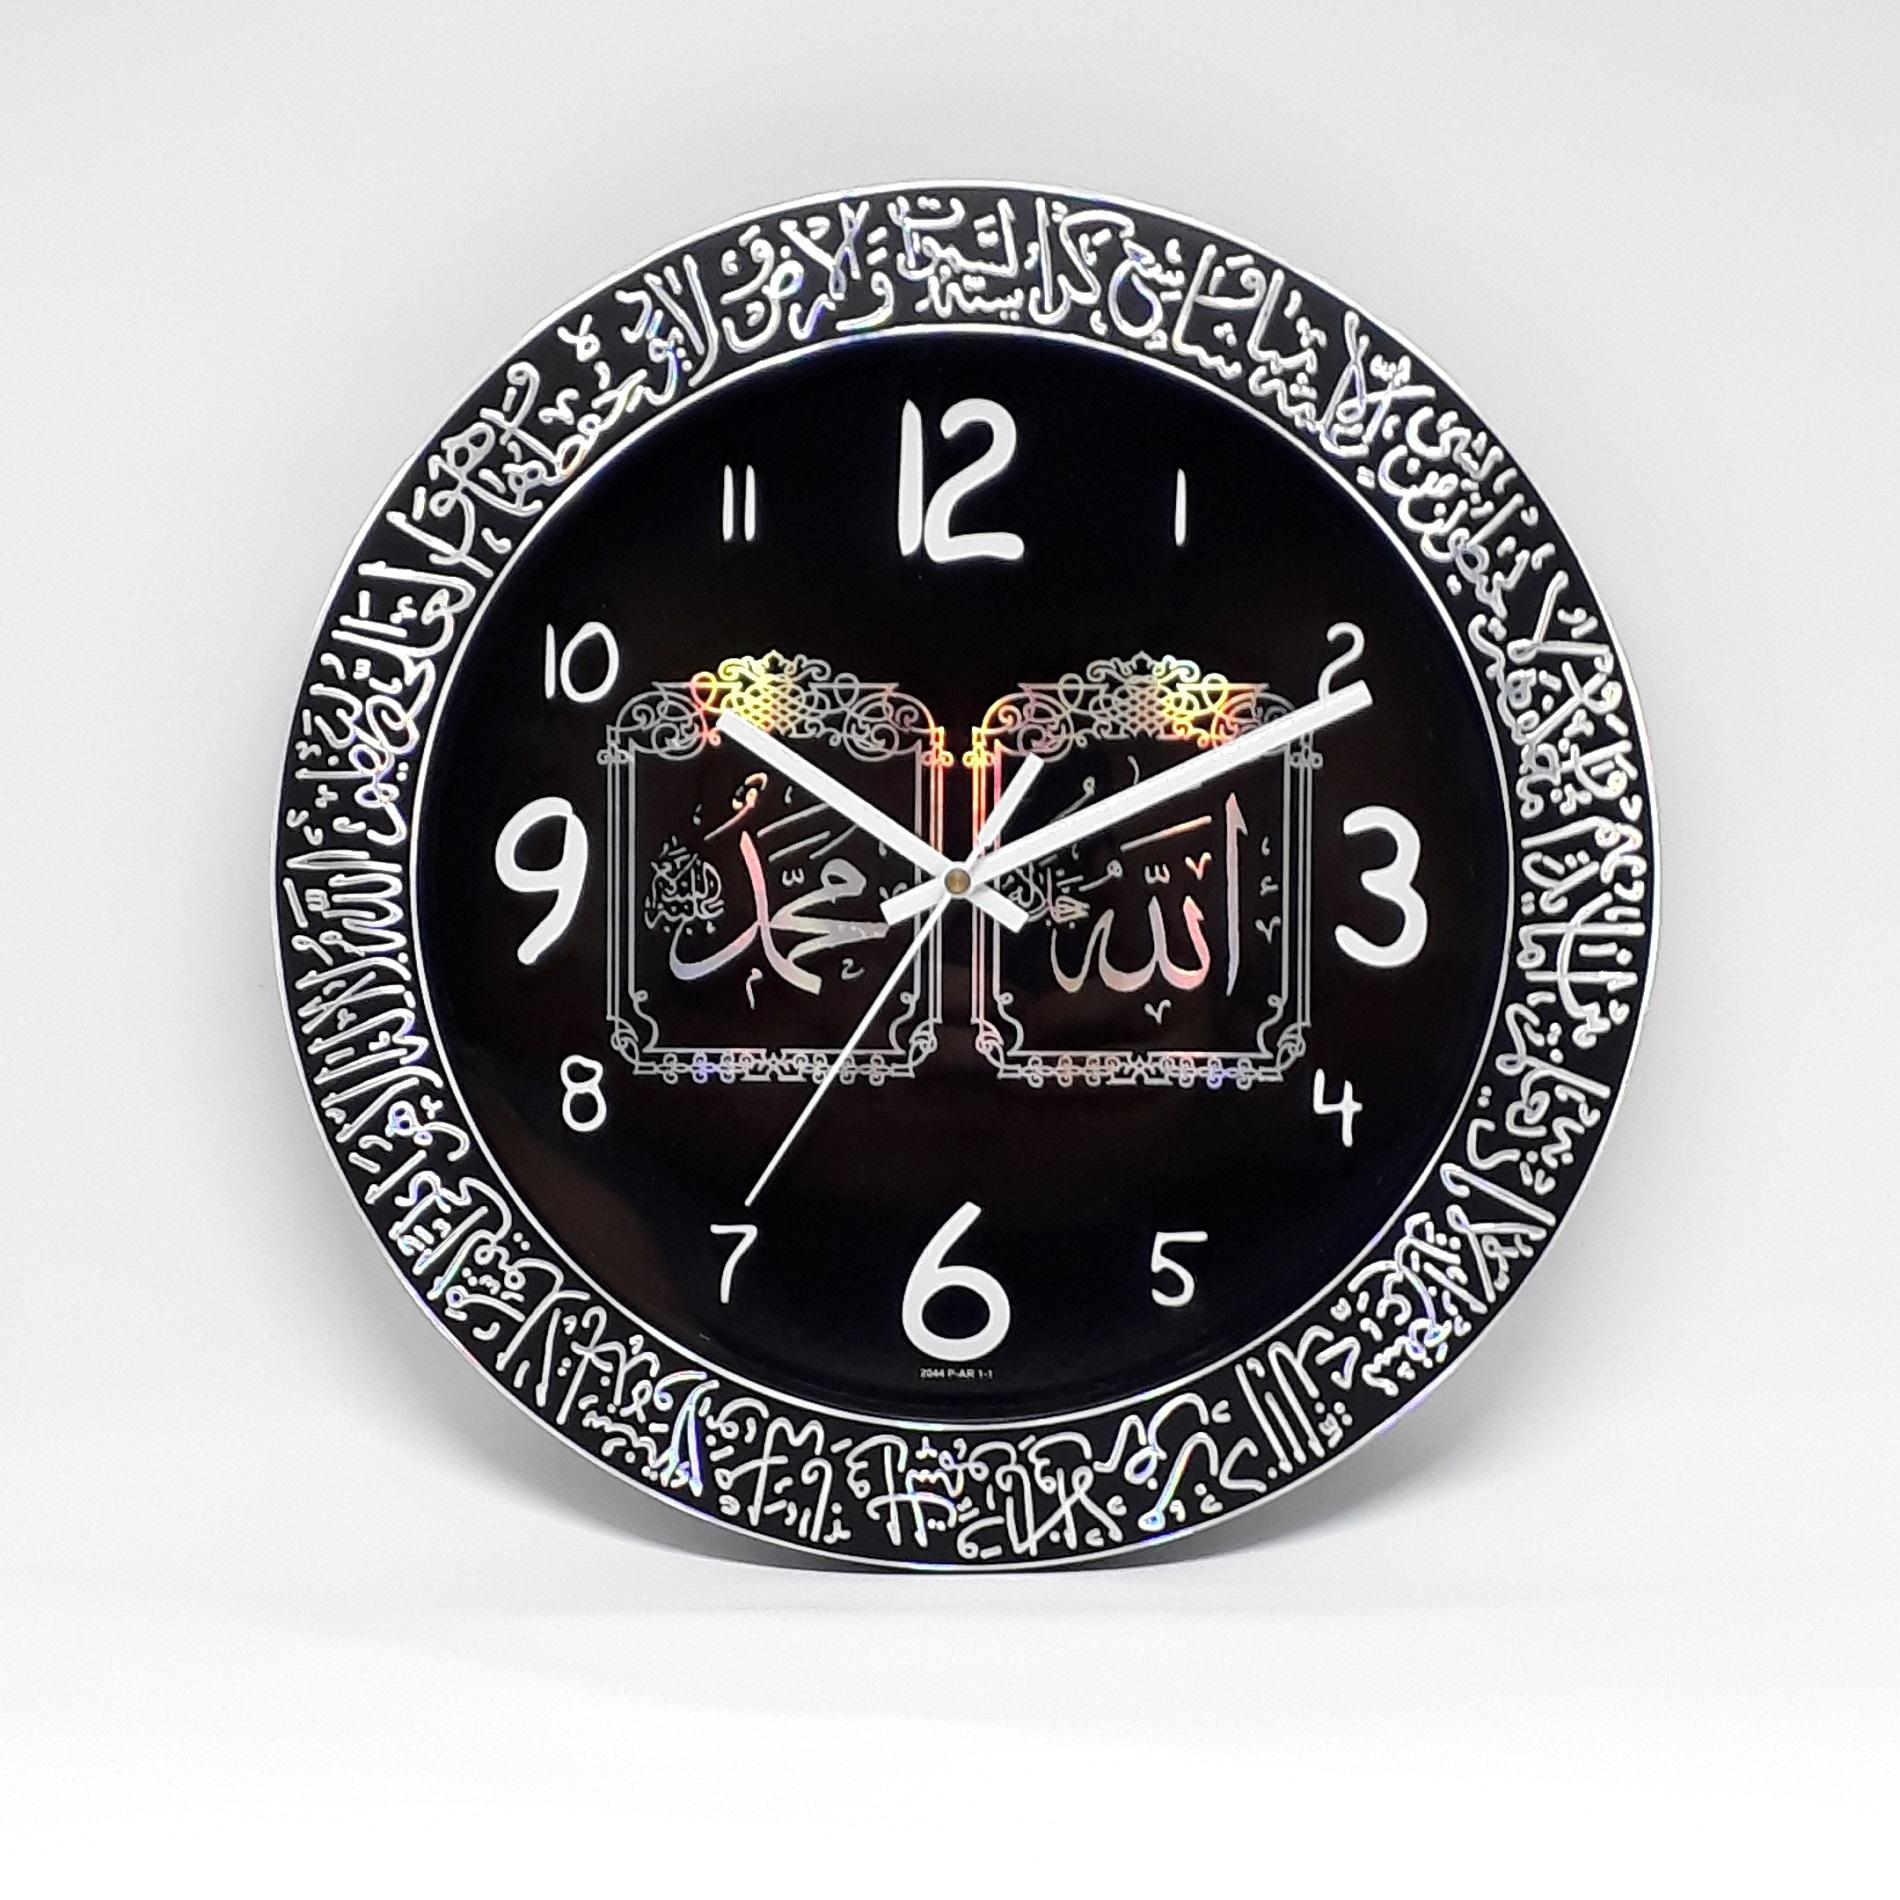 Jam Dinding Pioneer - Nuansa Islamic Kaligrafi